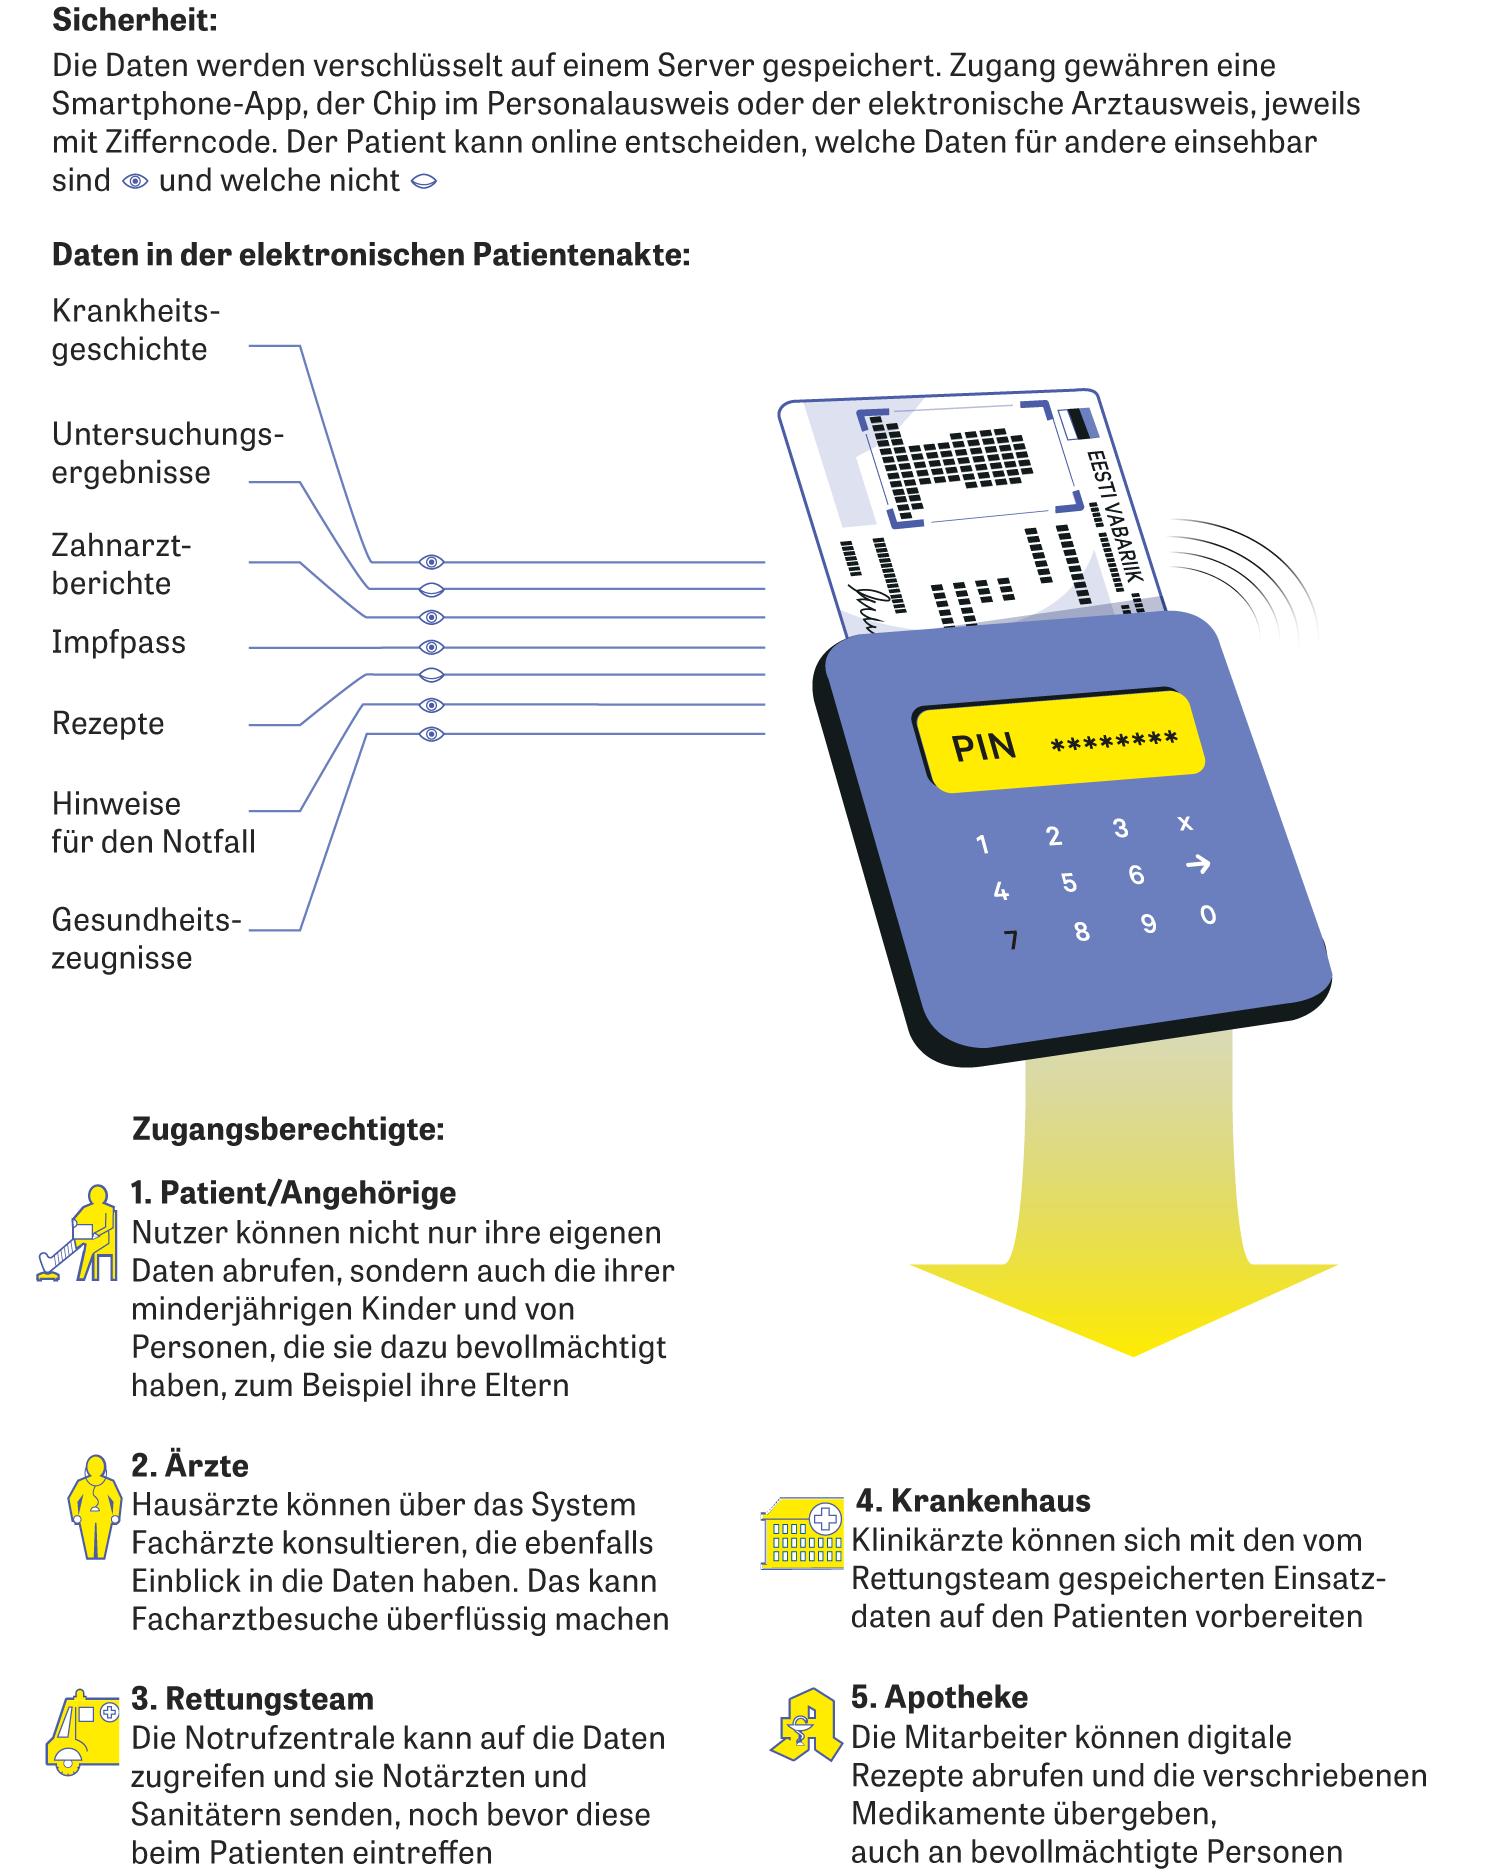 Jens Spahn: Digitalparadies Estland